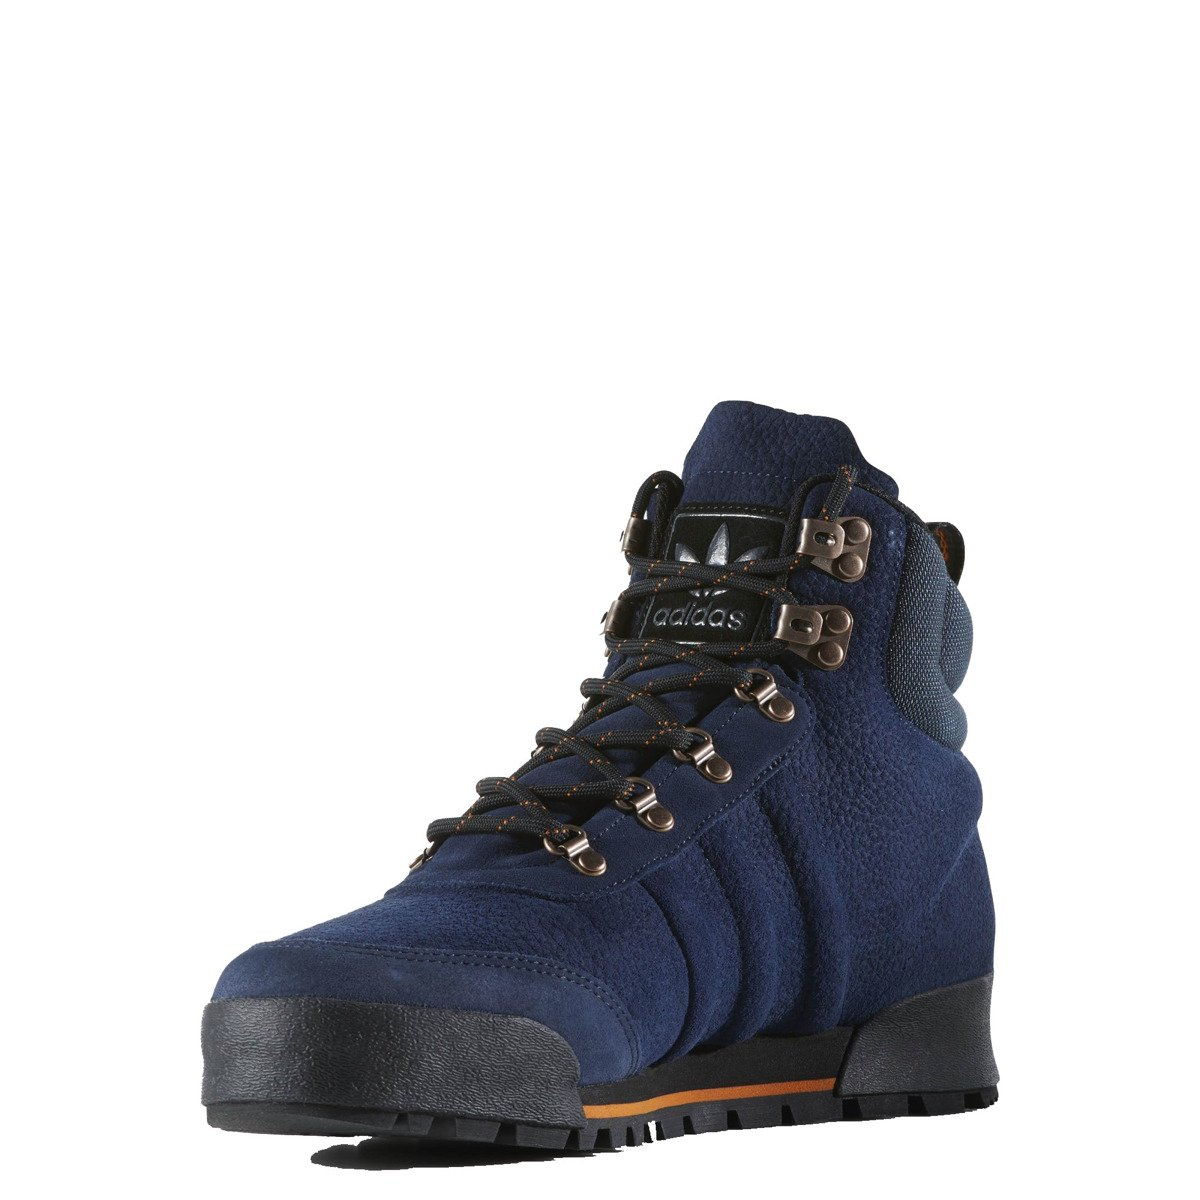 adidas equipment schuhe, adidas Jake Boot 2.0 Skate